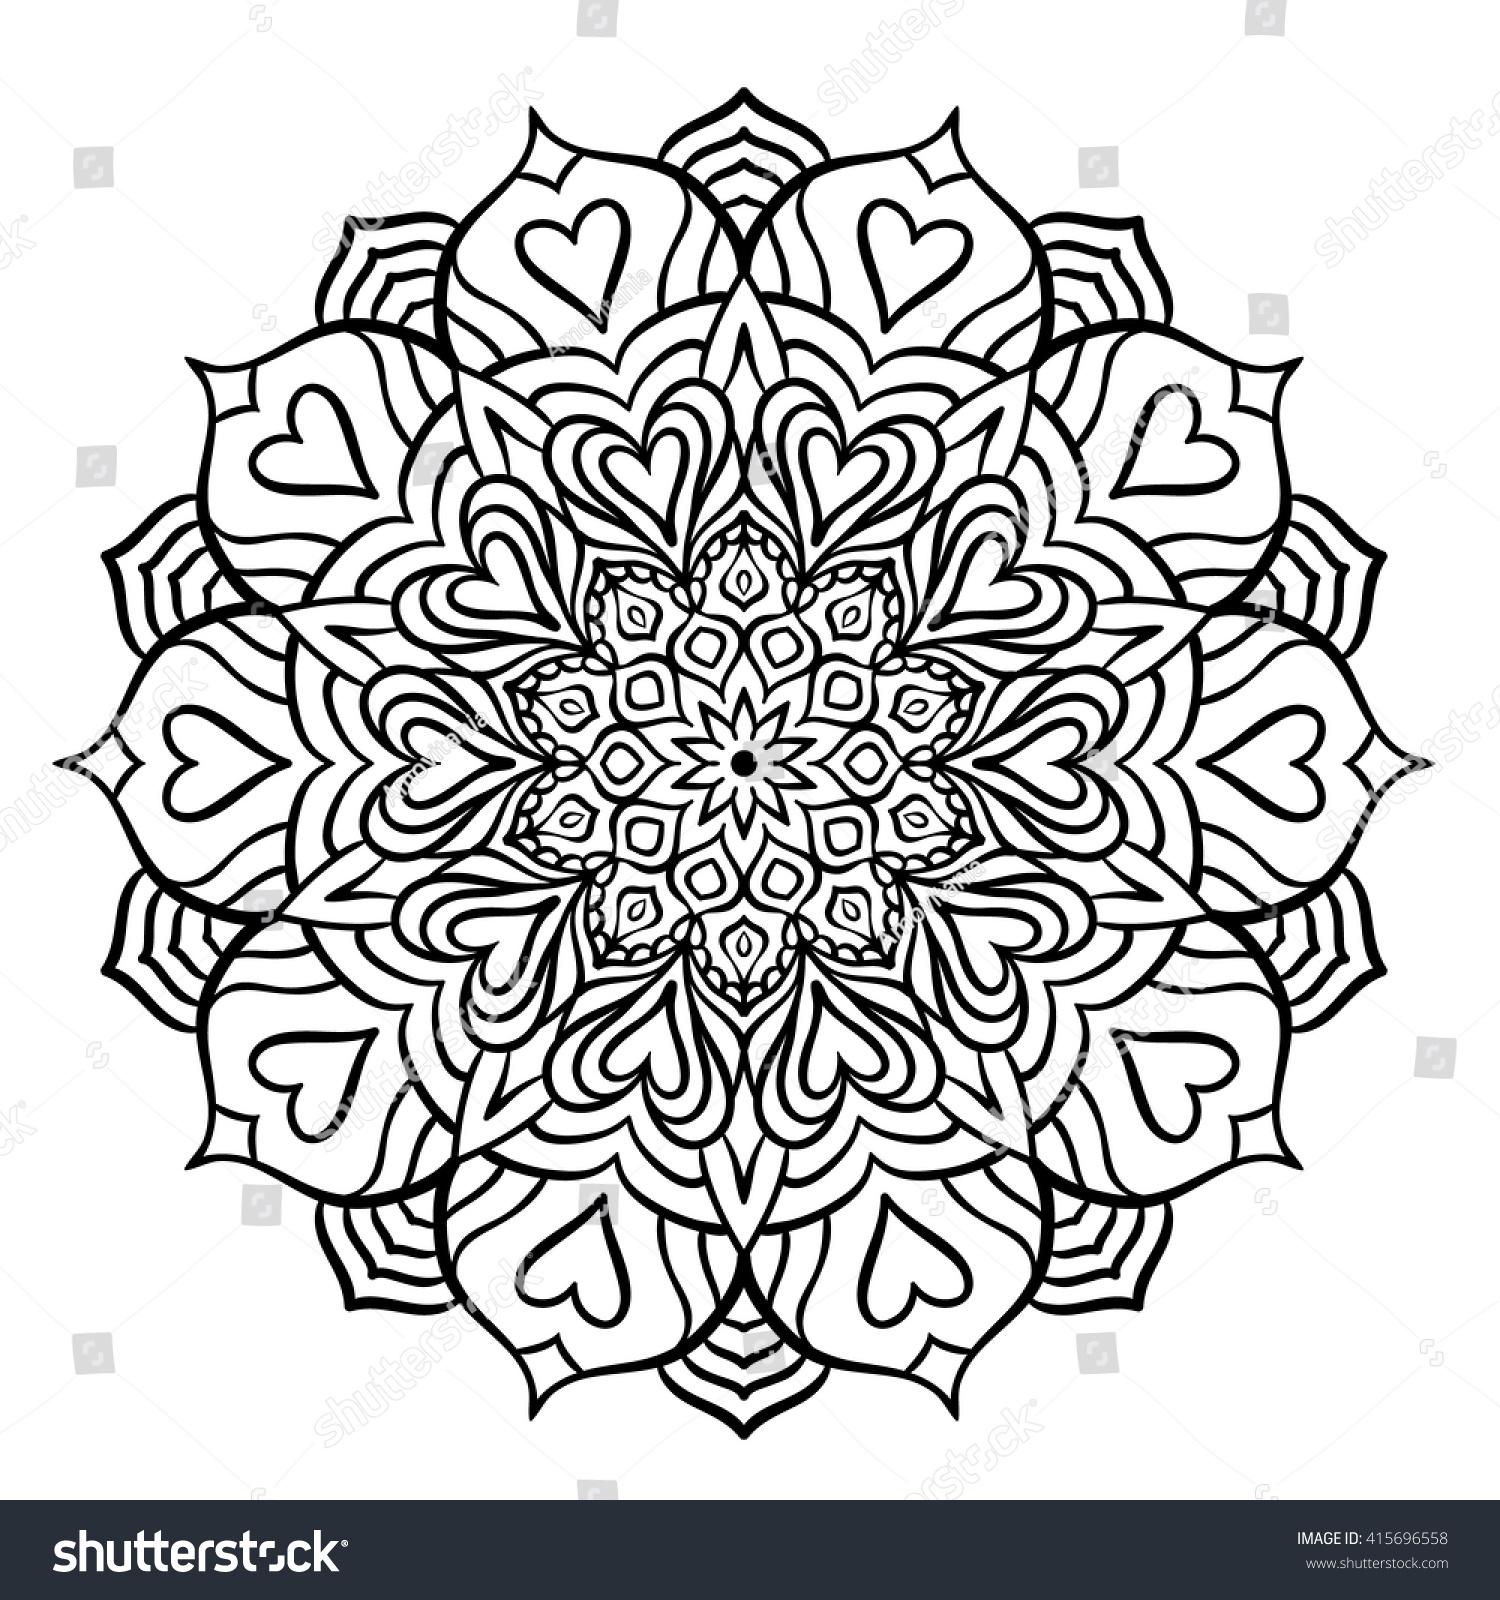 Outline Mandala Coloring Book Decorative Round Stock ...